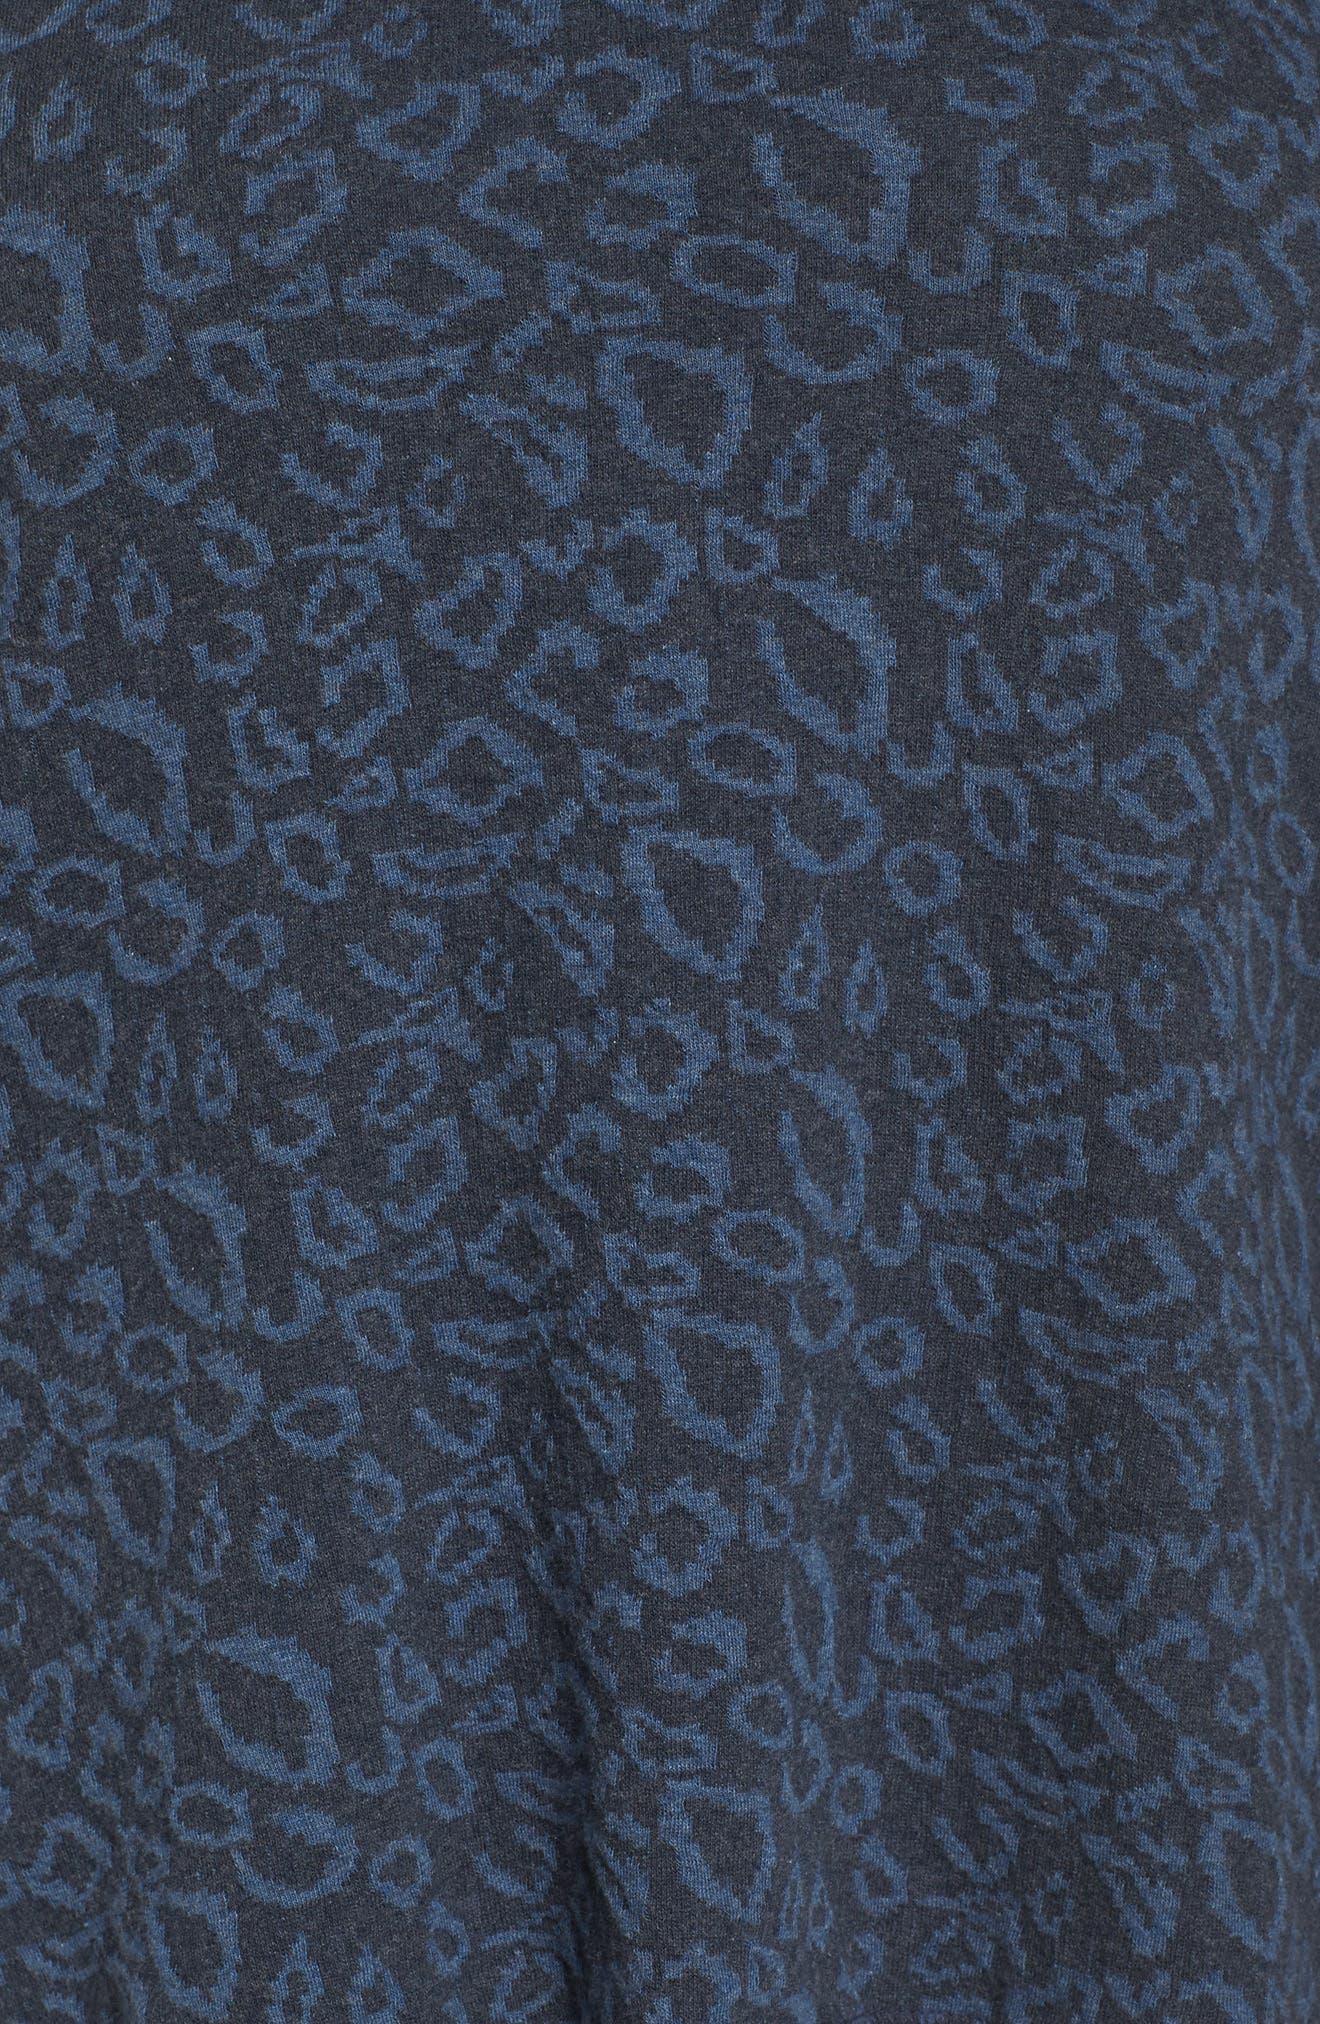 Cheetah Print Top,                             Alternate thumbnail 5, color,                             Blue Multi